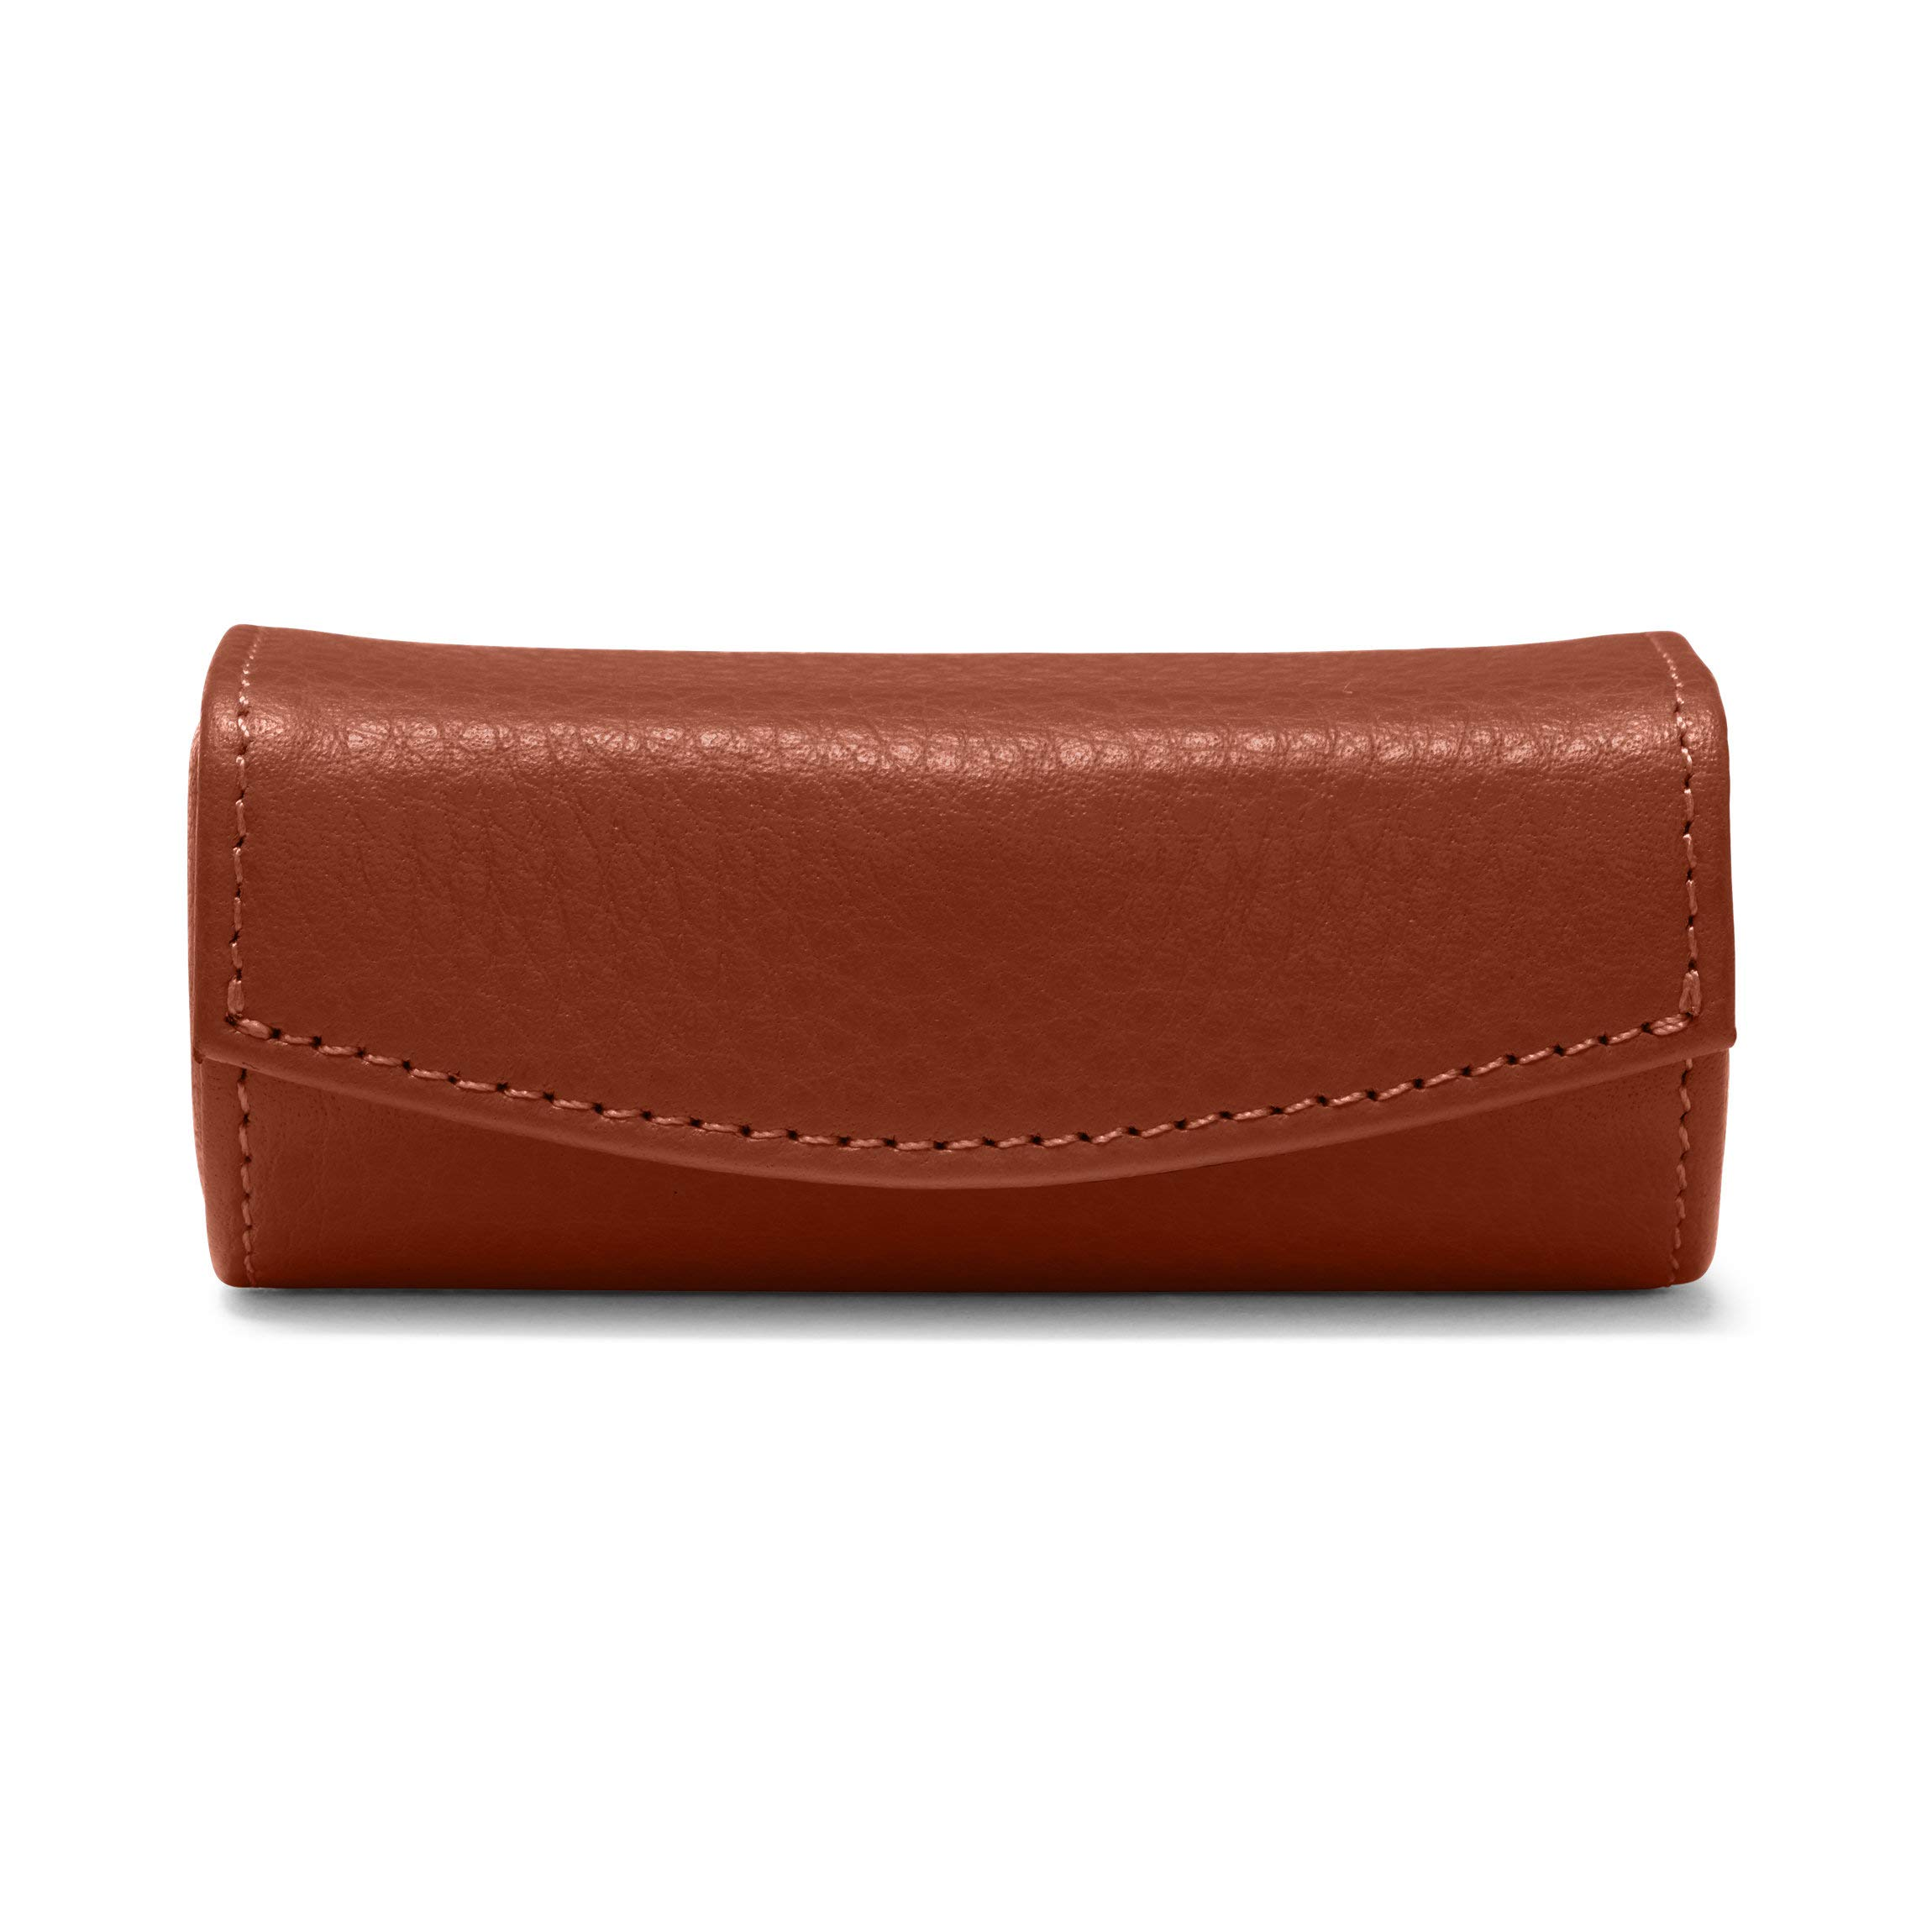 Lipstick Case - Full Grain Leather Leather - Terracotta (Orange)